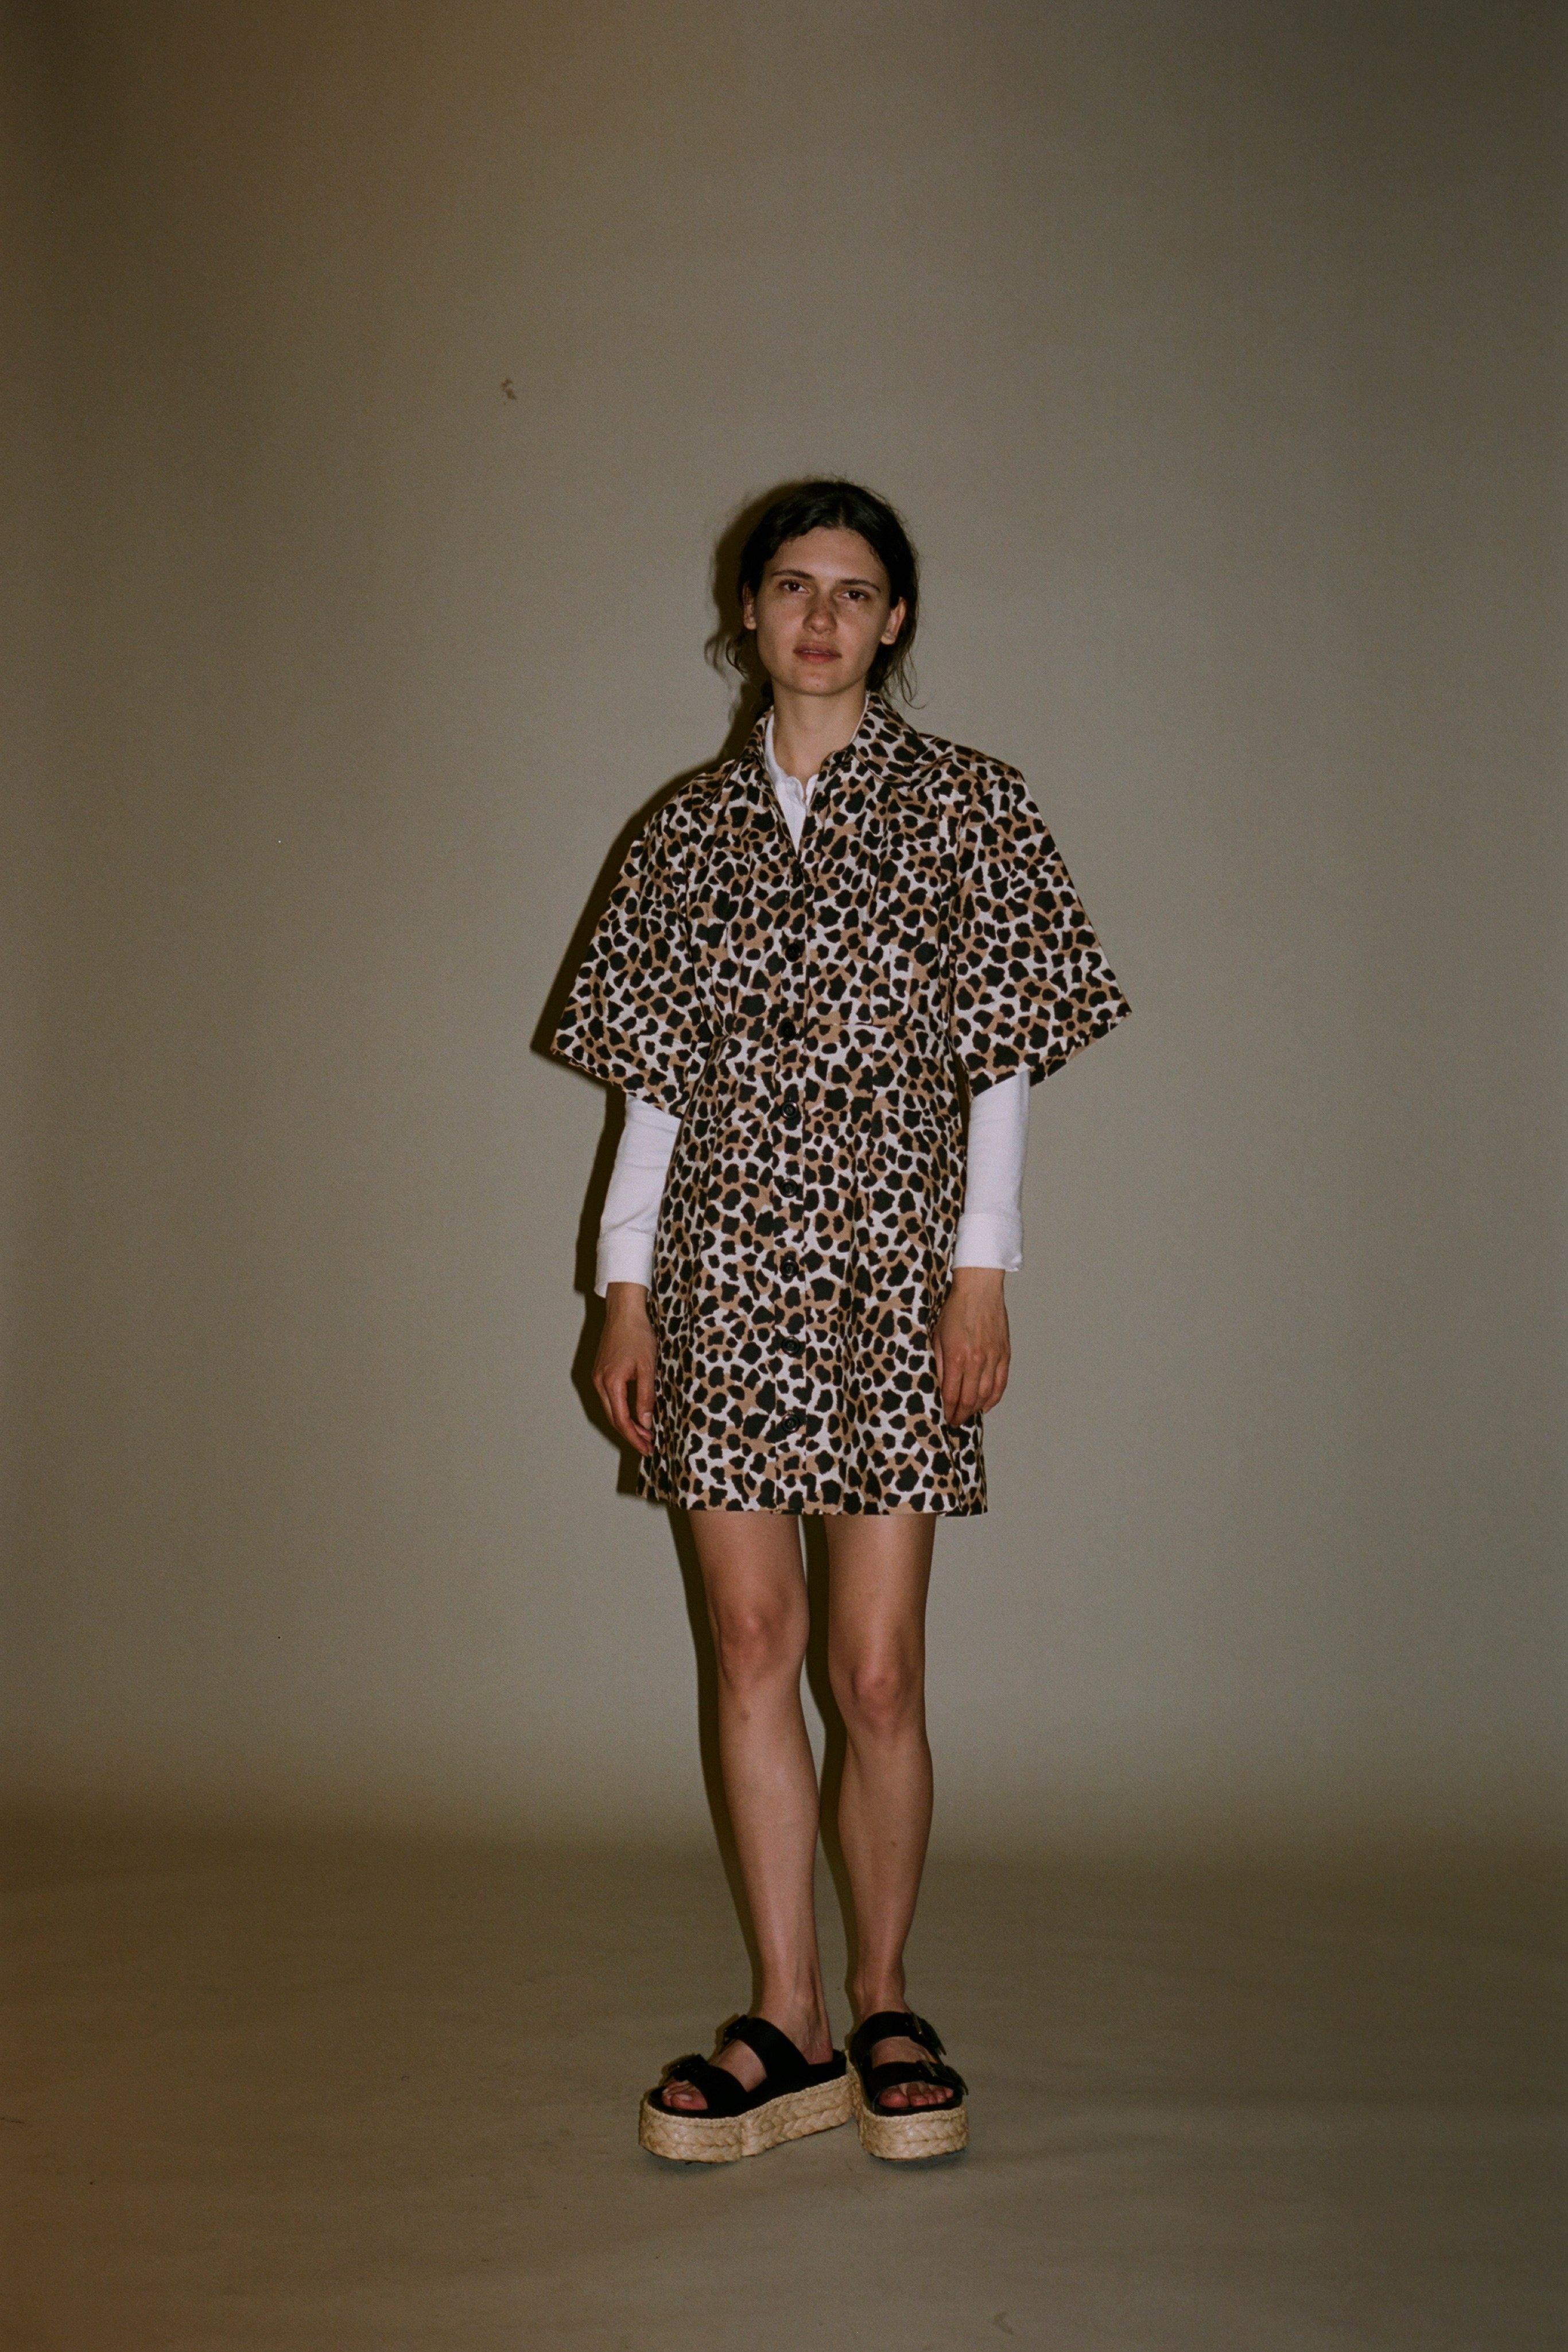 Apollo leopard print shirt dress